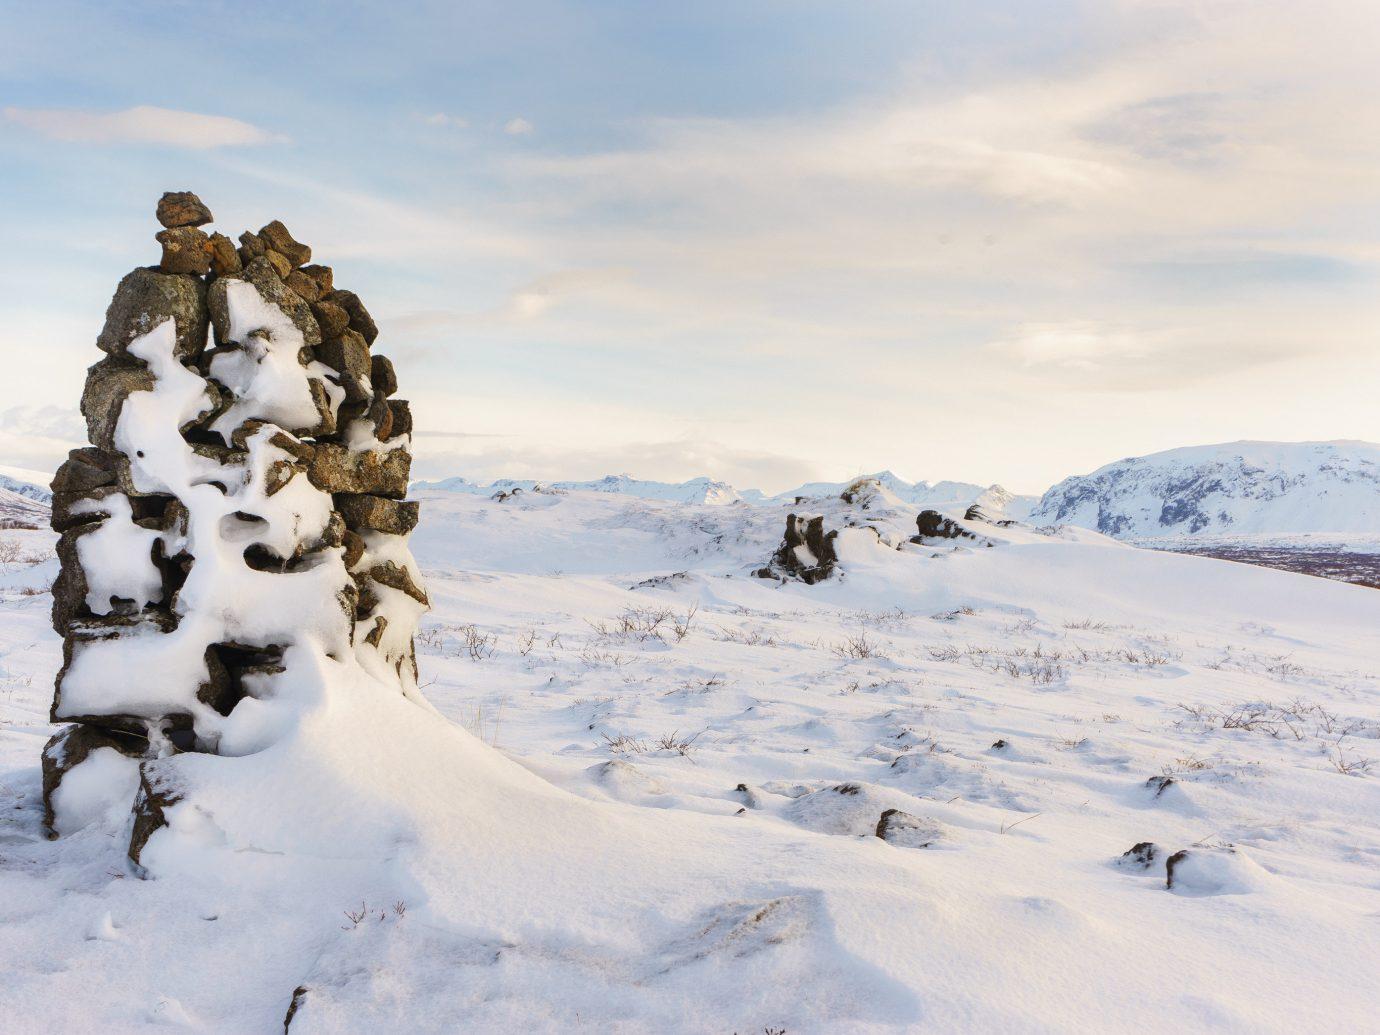 Iceland Trip Ideas snow outdoor sky Nature Winter mountainous landforms covered mountain weather geological phenomenon season mountain range footwear arctic hill ski touring ski mountaineering summit snowshoe slope day